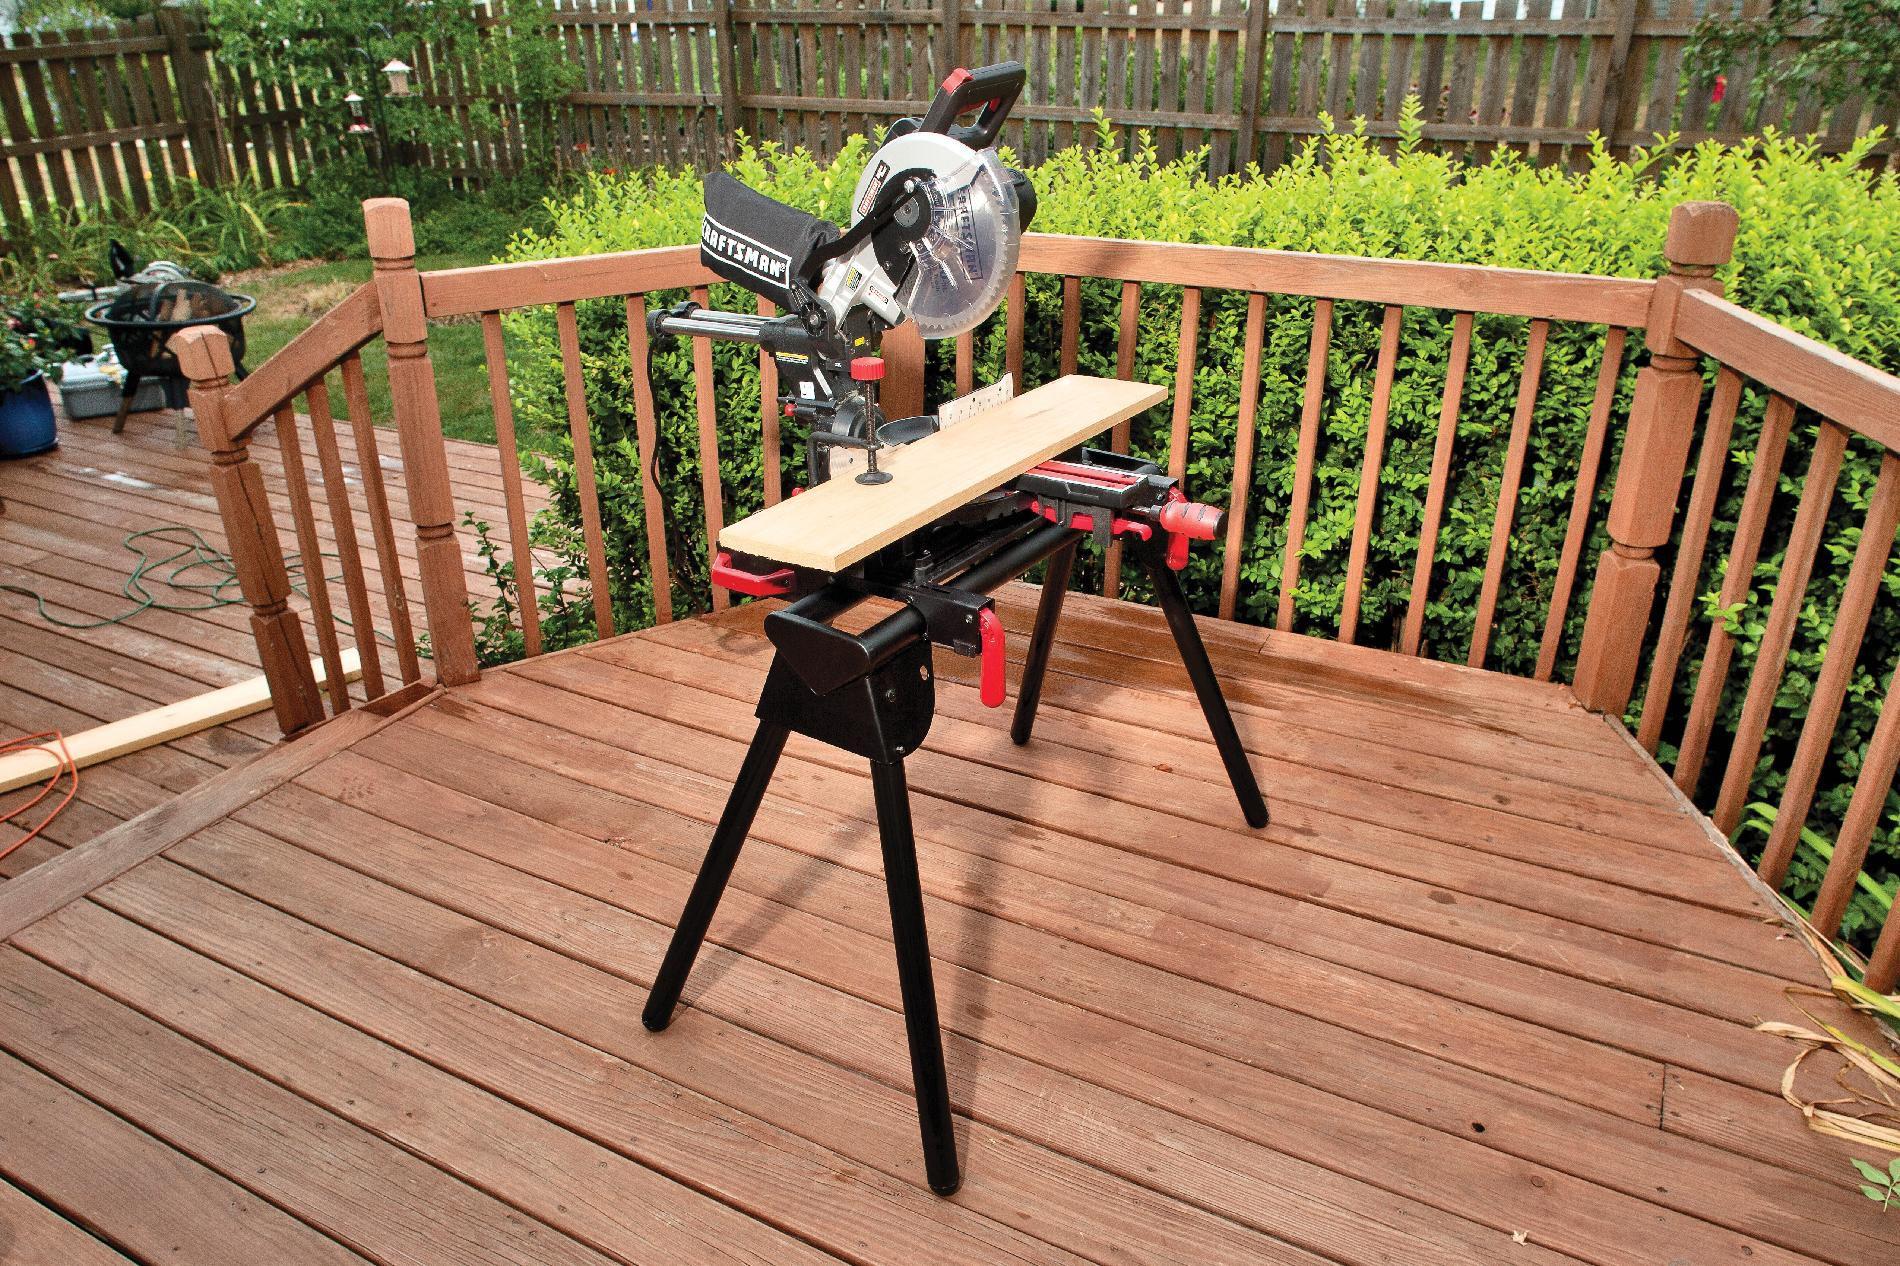 Craftsman Craftsman Heavy Duty Tool Stand